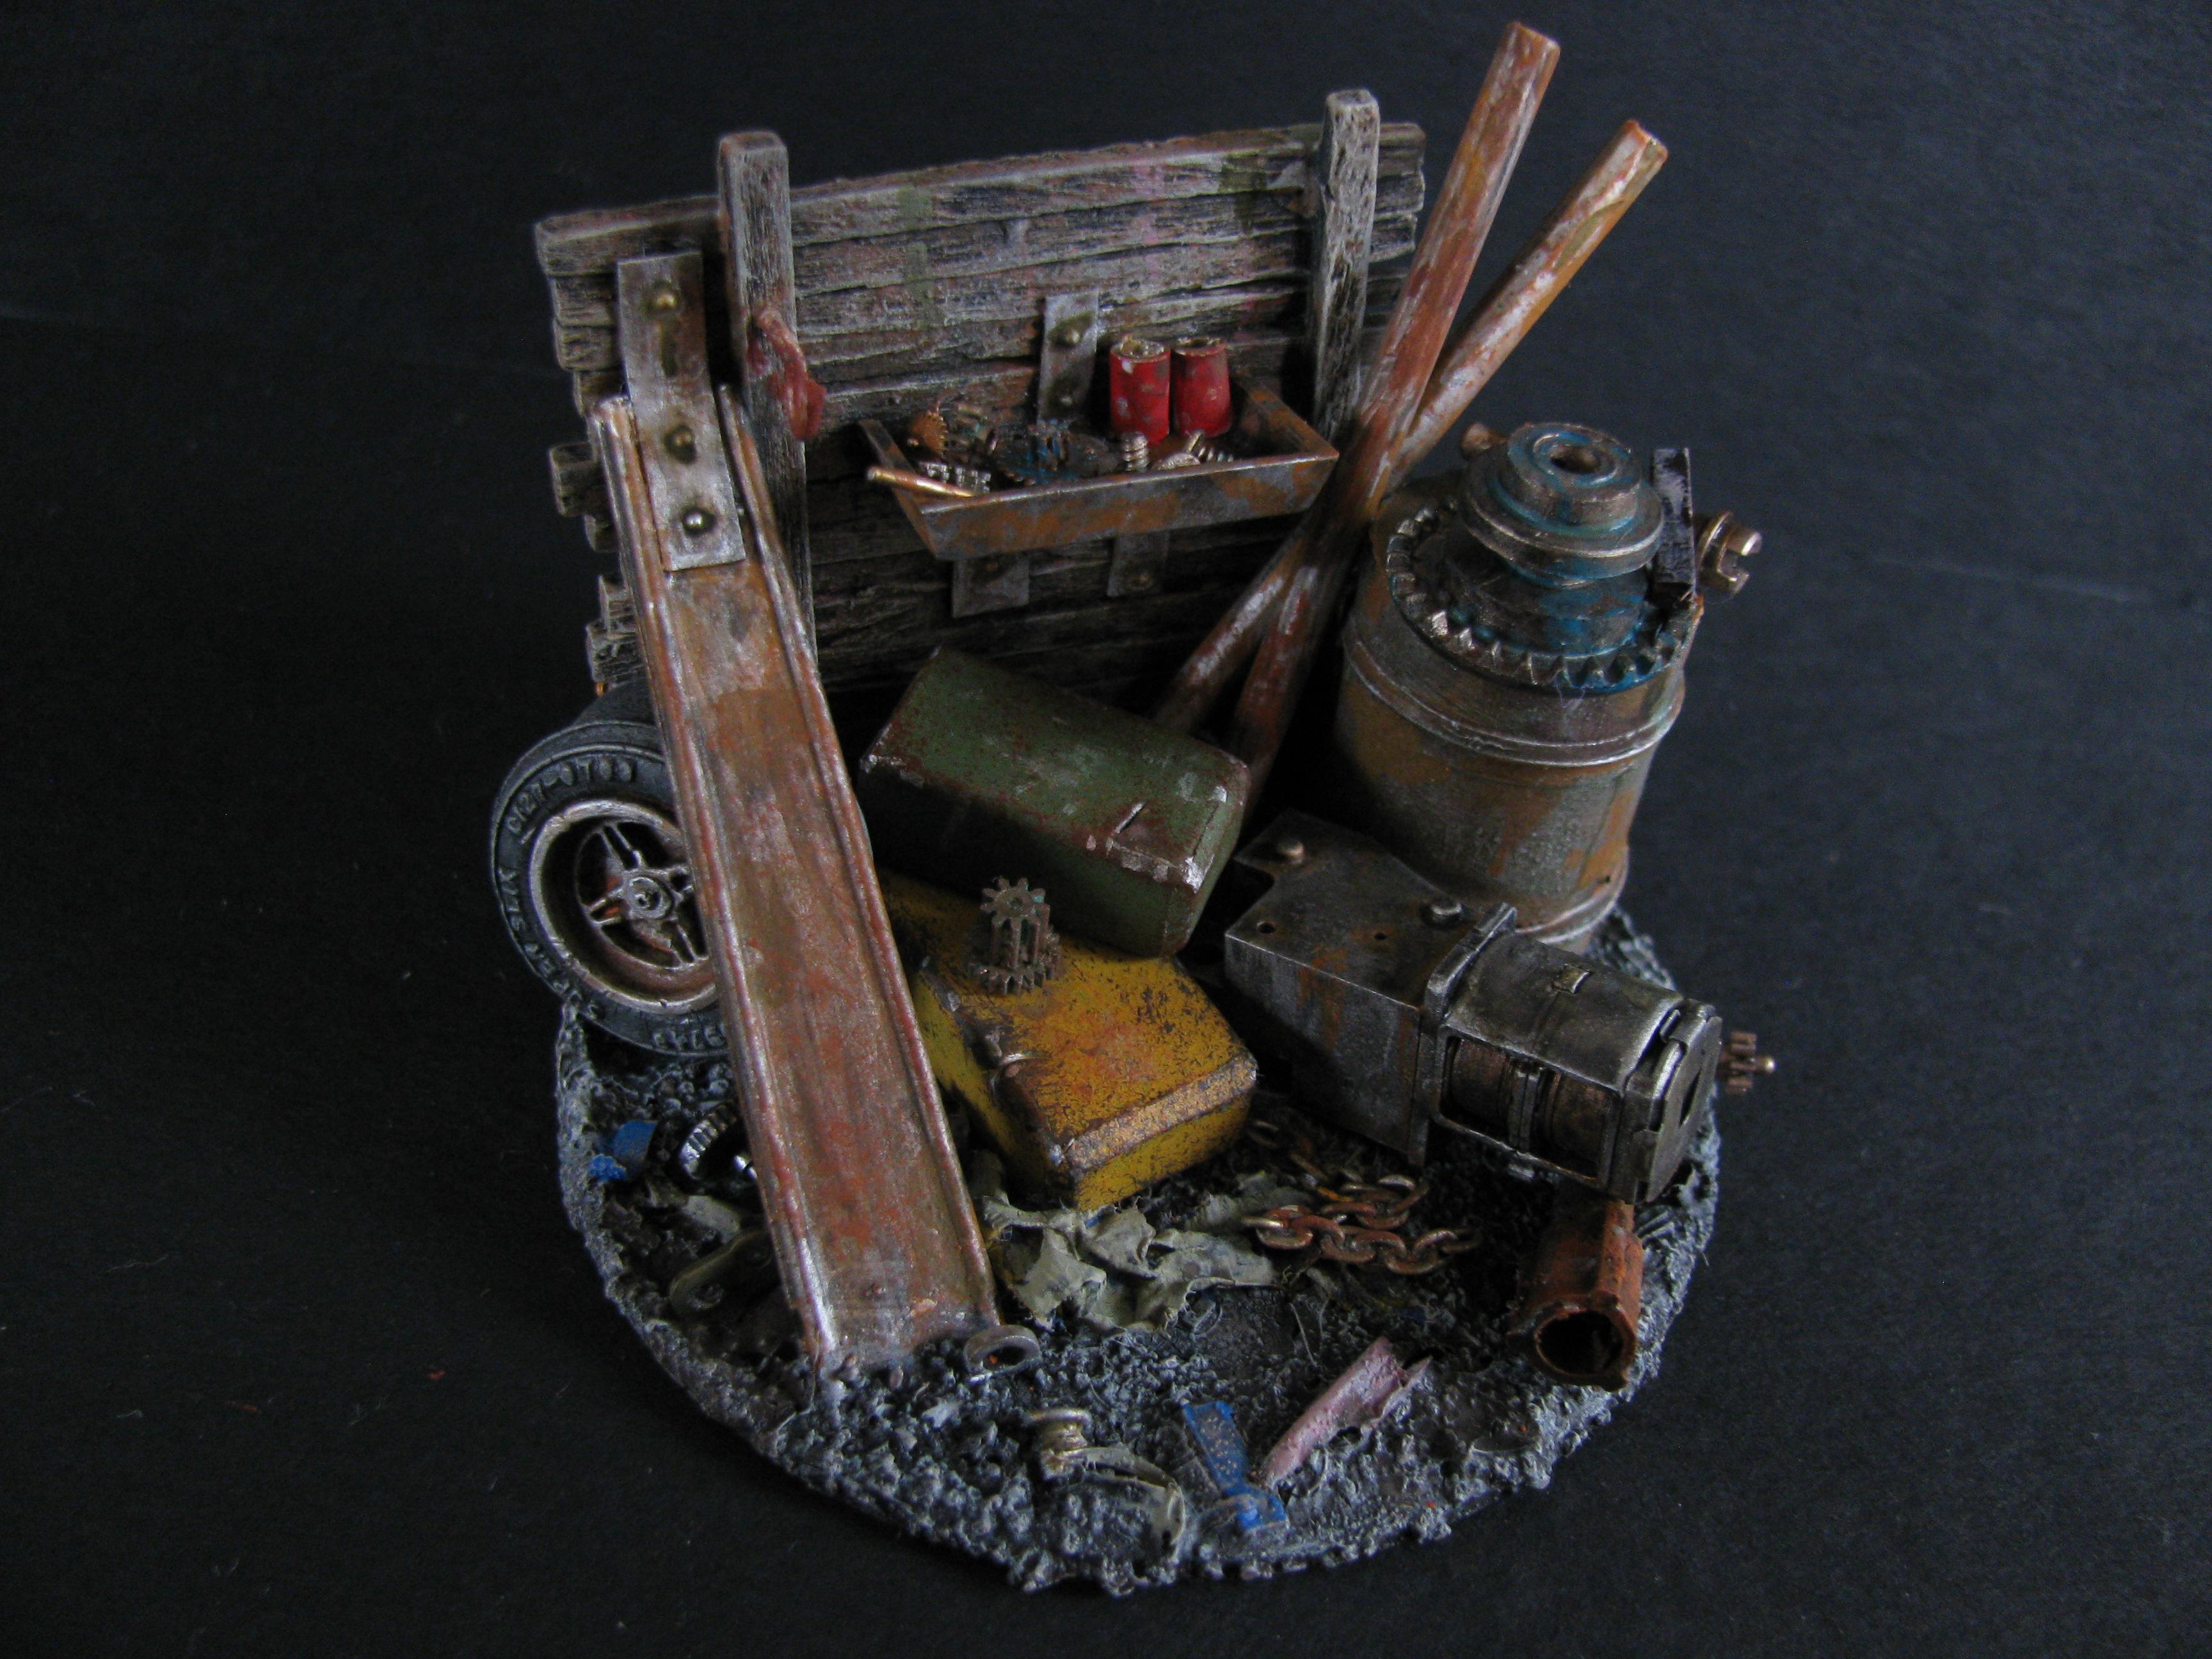 Inquisimunda, Junk, Junk Pile, Munda, Orks, Orky, Terrain, Warhammer 40,000